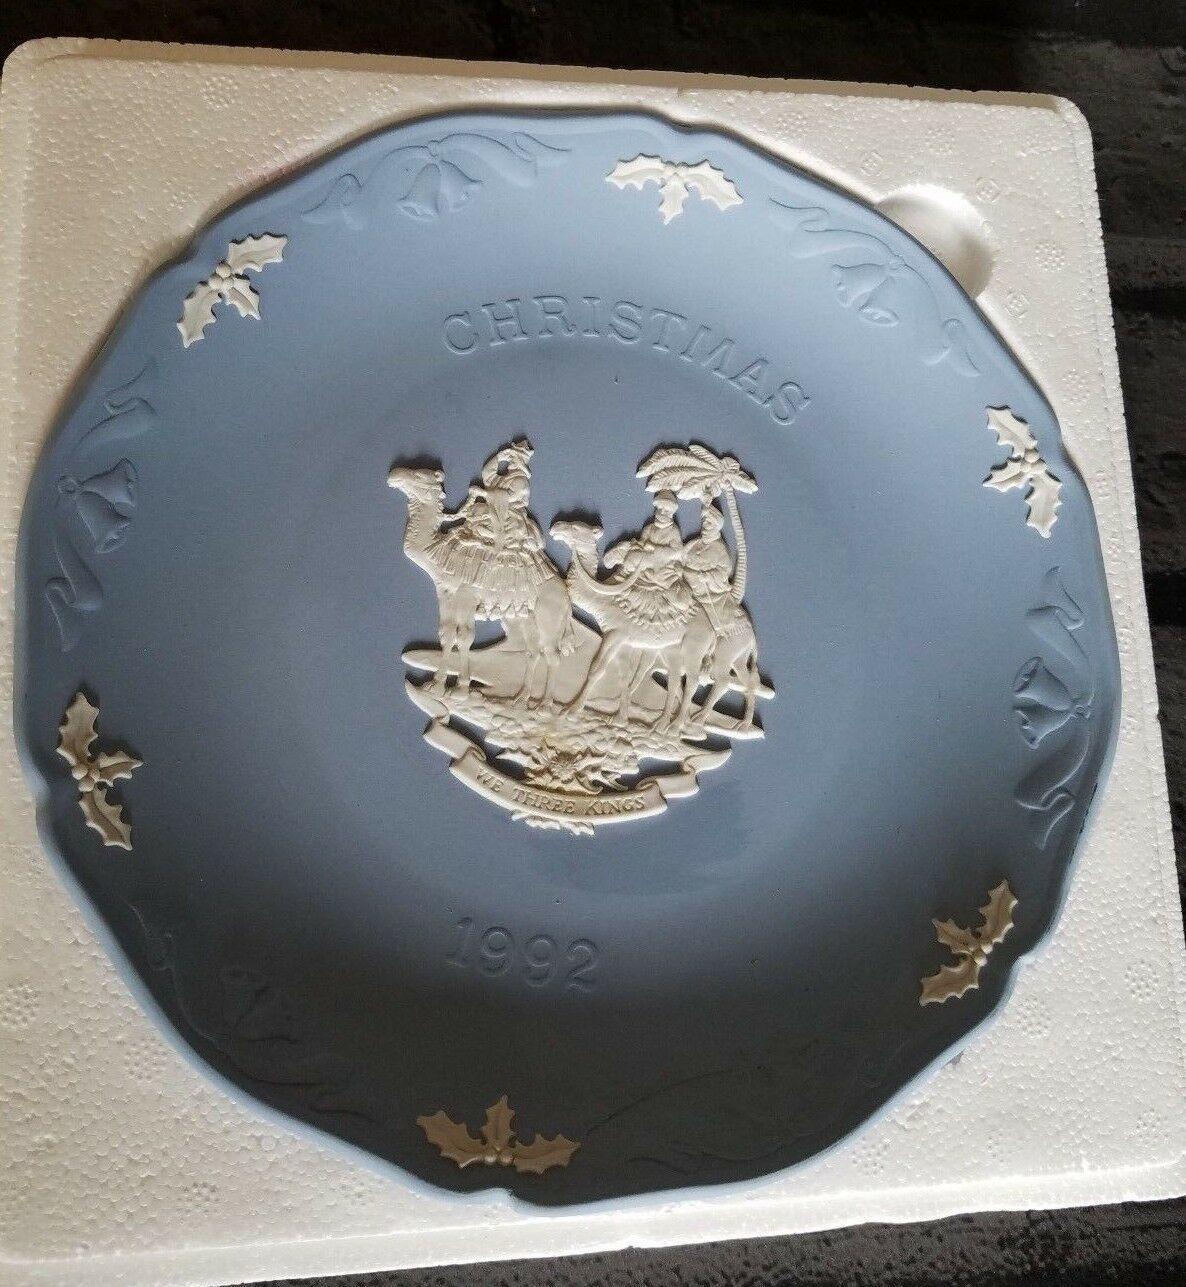 "Wedgwood Blue Jasperware Christmas 3 Kings 1992 Collectible Plate  7.25"" - $15.00"